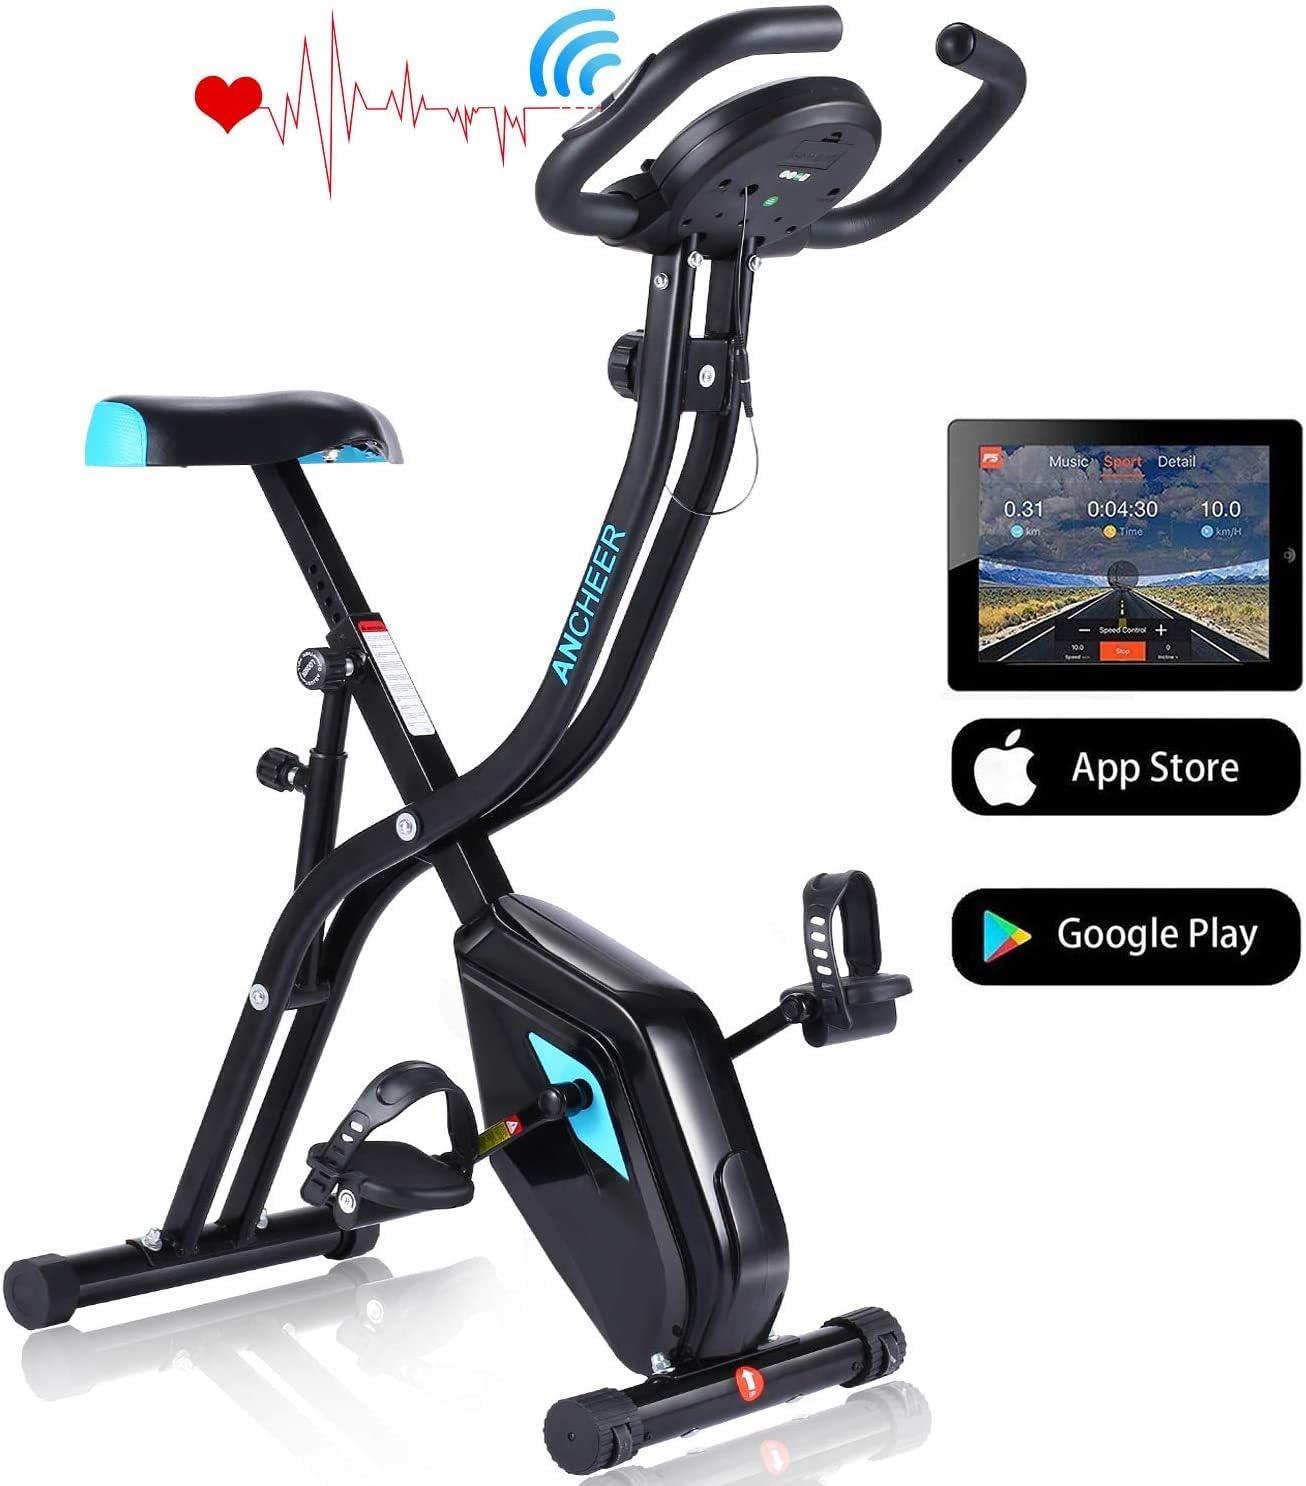 ANCHEER Exercise Bike Fitness Bike, Foldable